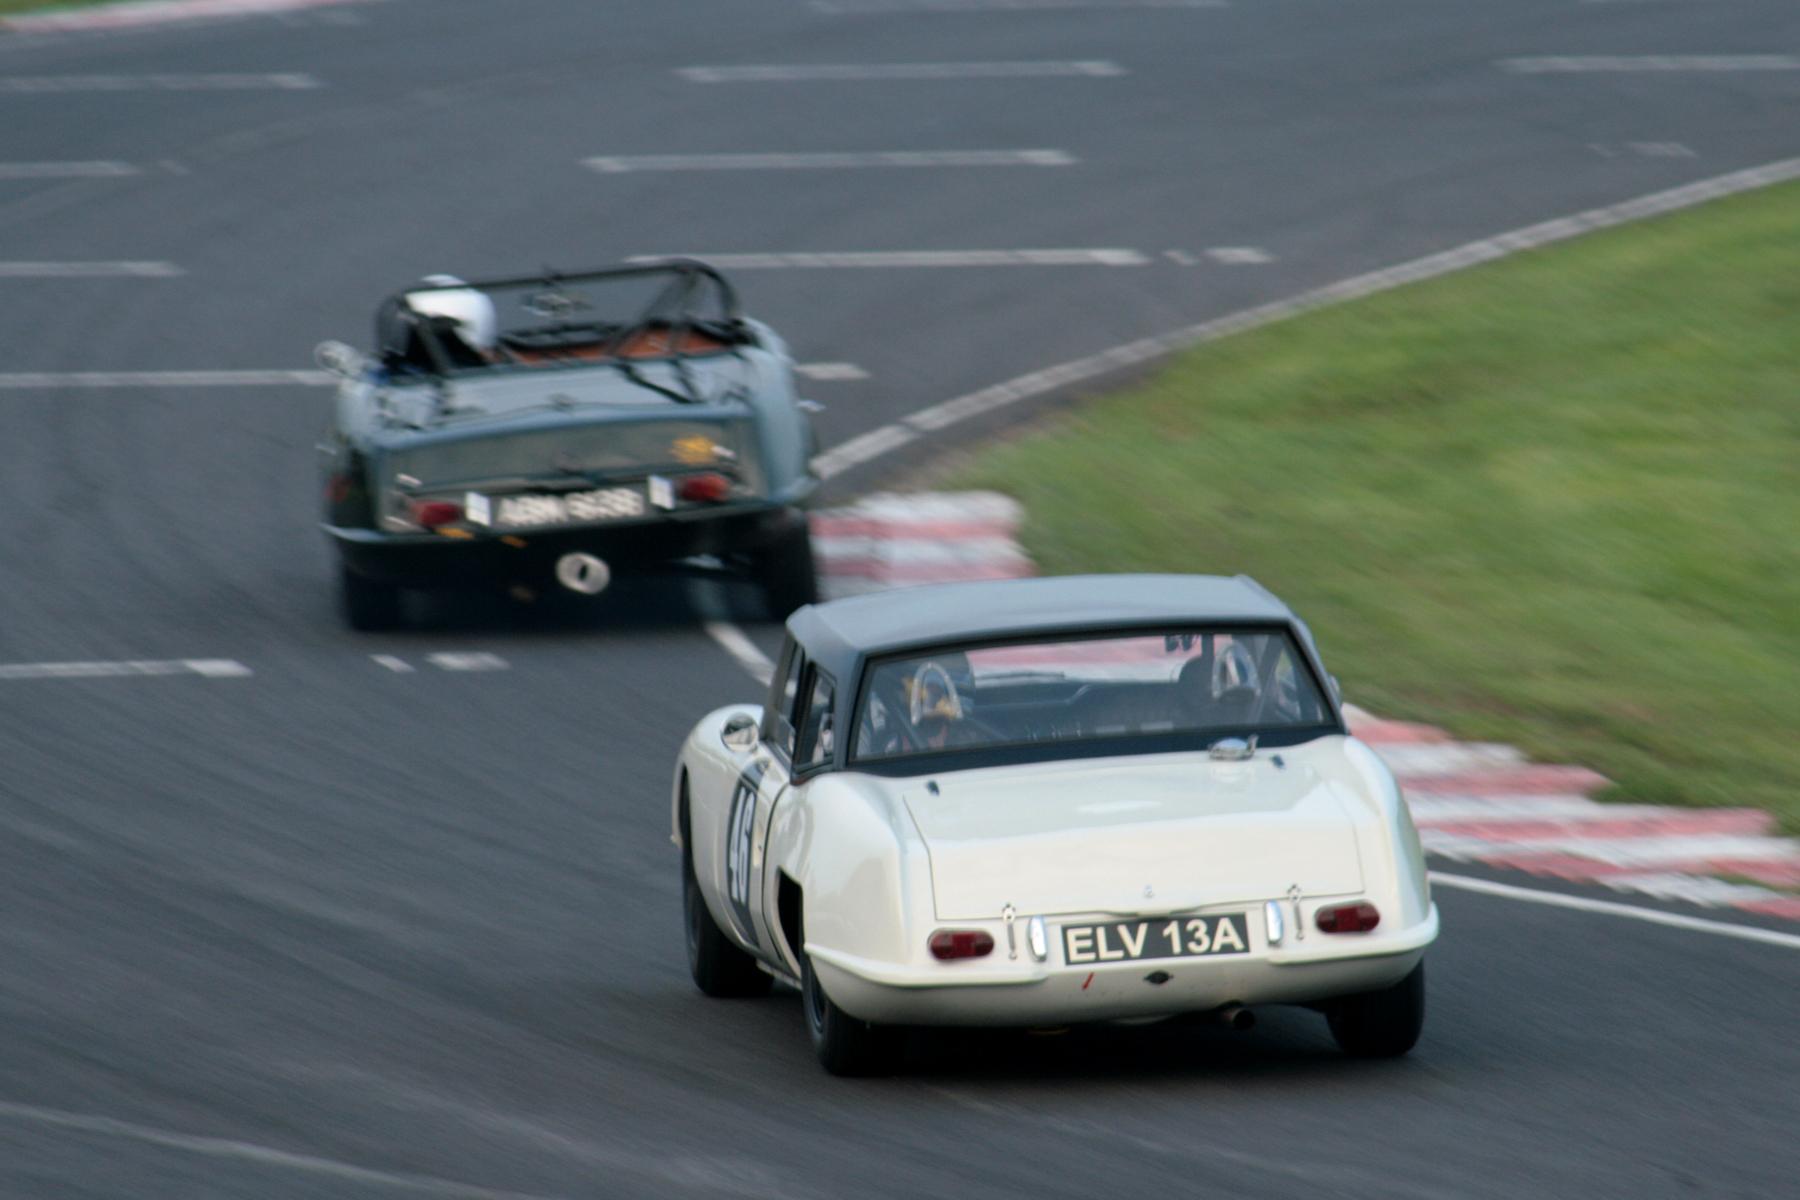 Jonathan Loader chases Sean Kukula, both in Elva Courier Mk4Ts. Anyone got a decent pic of Sean's car? Photo - John Turner